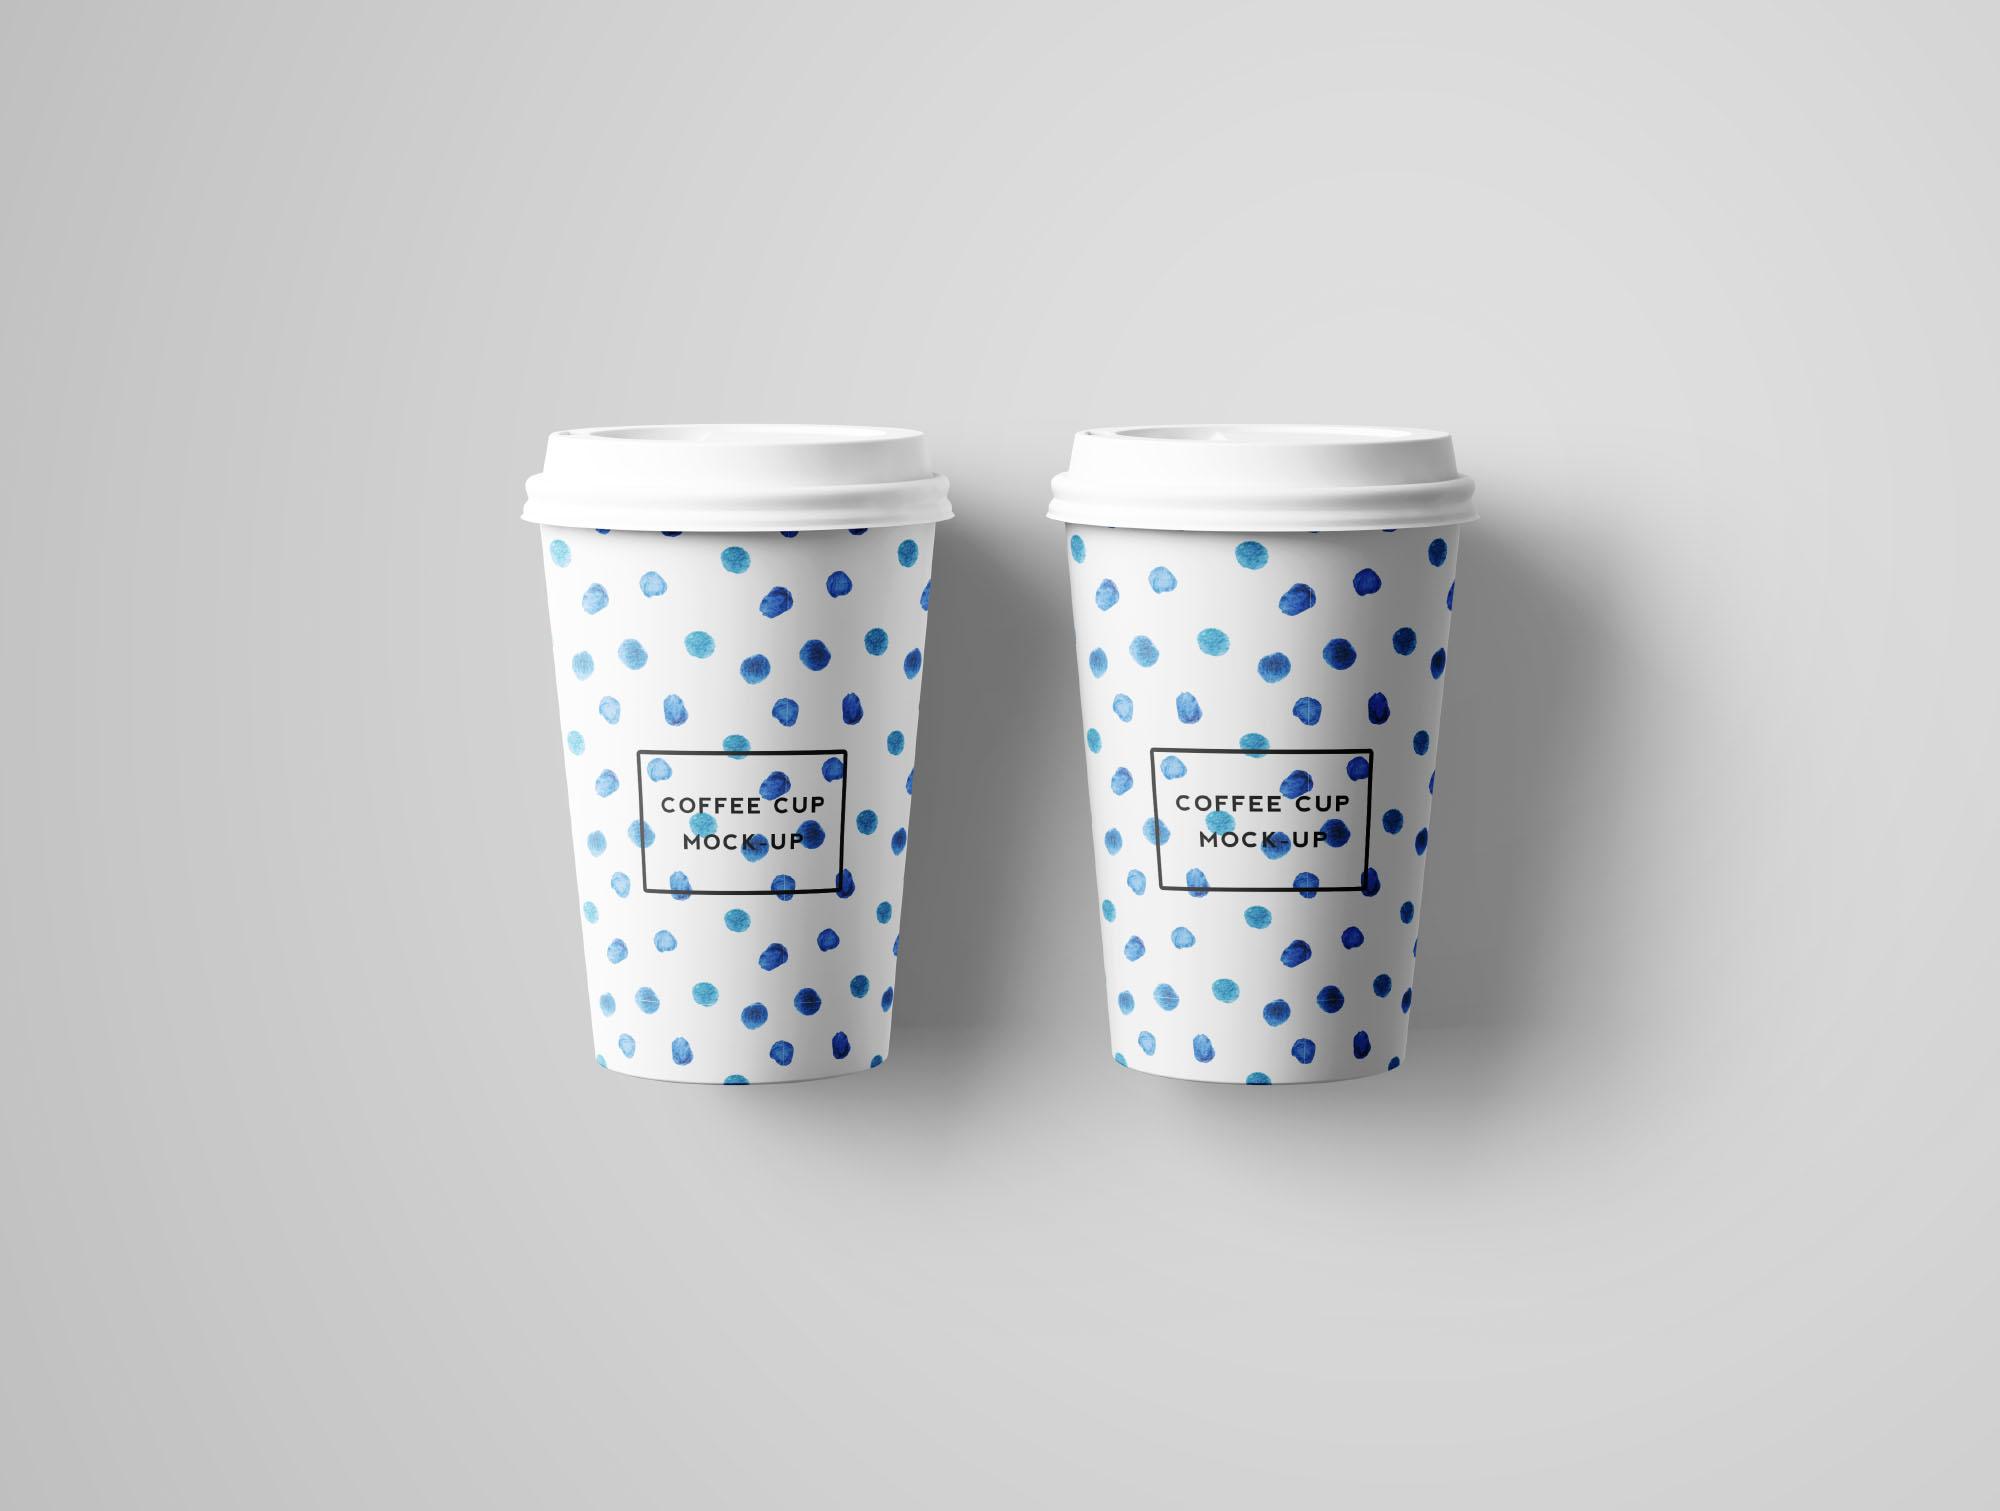 Coffee Cup Mockup - Top